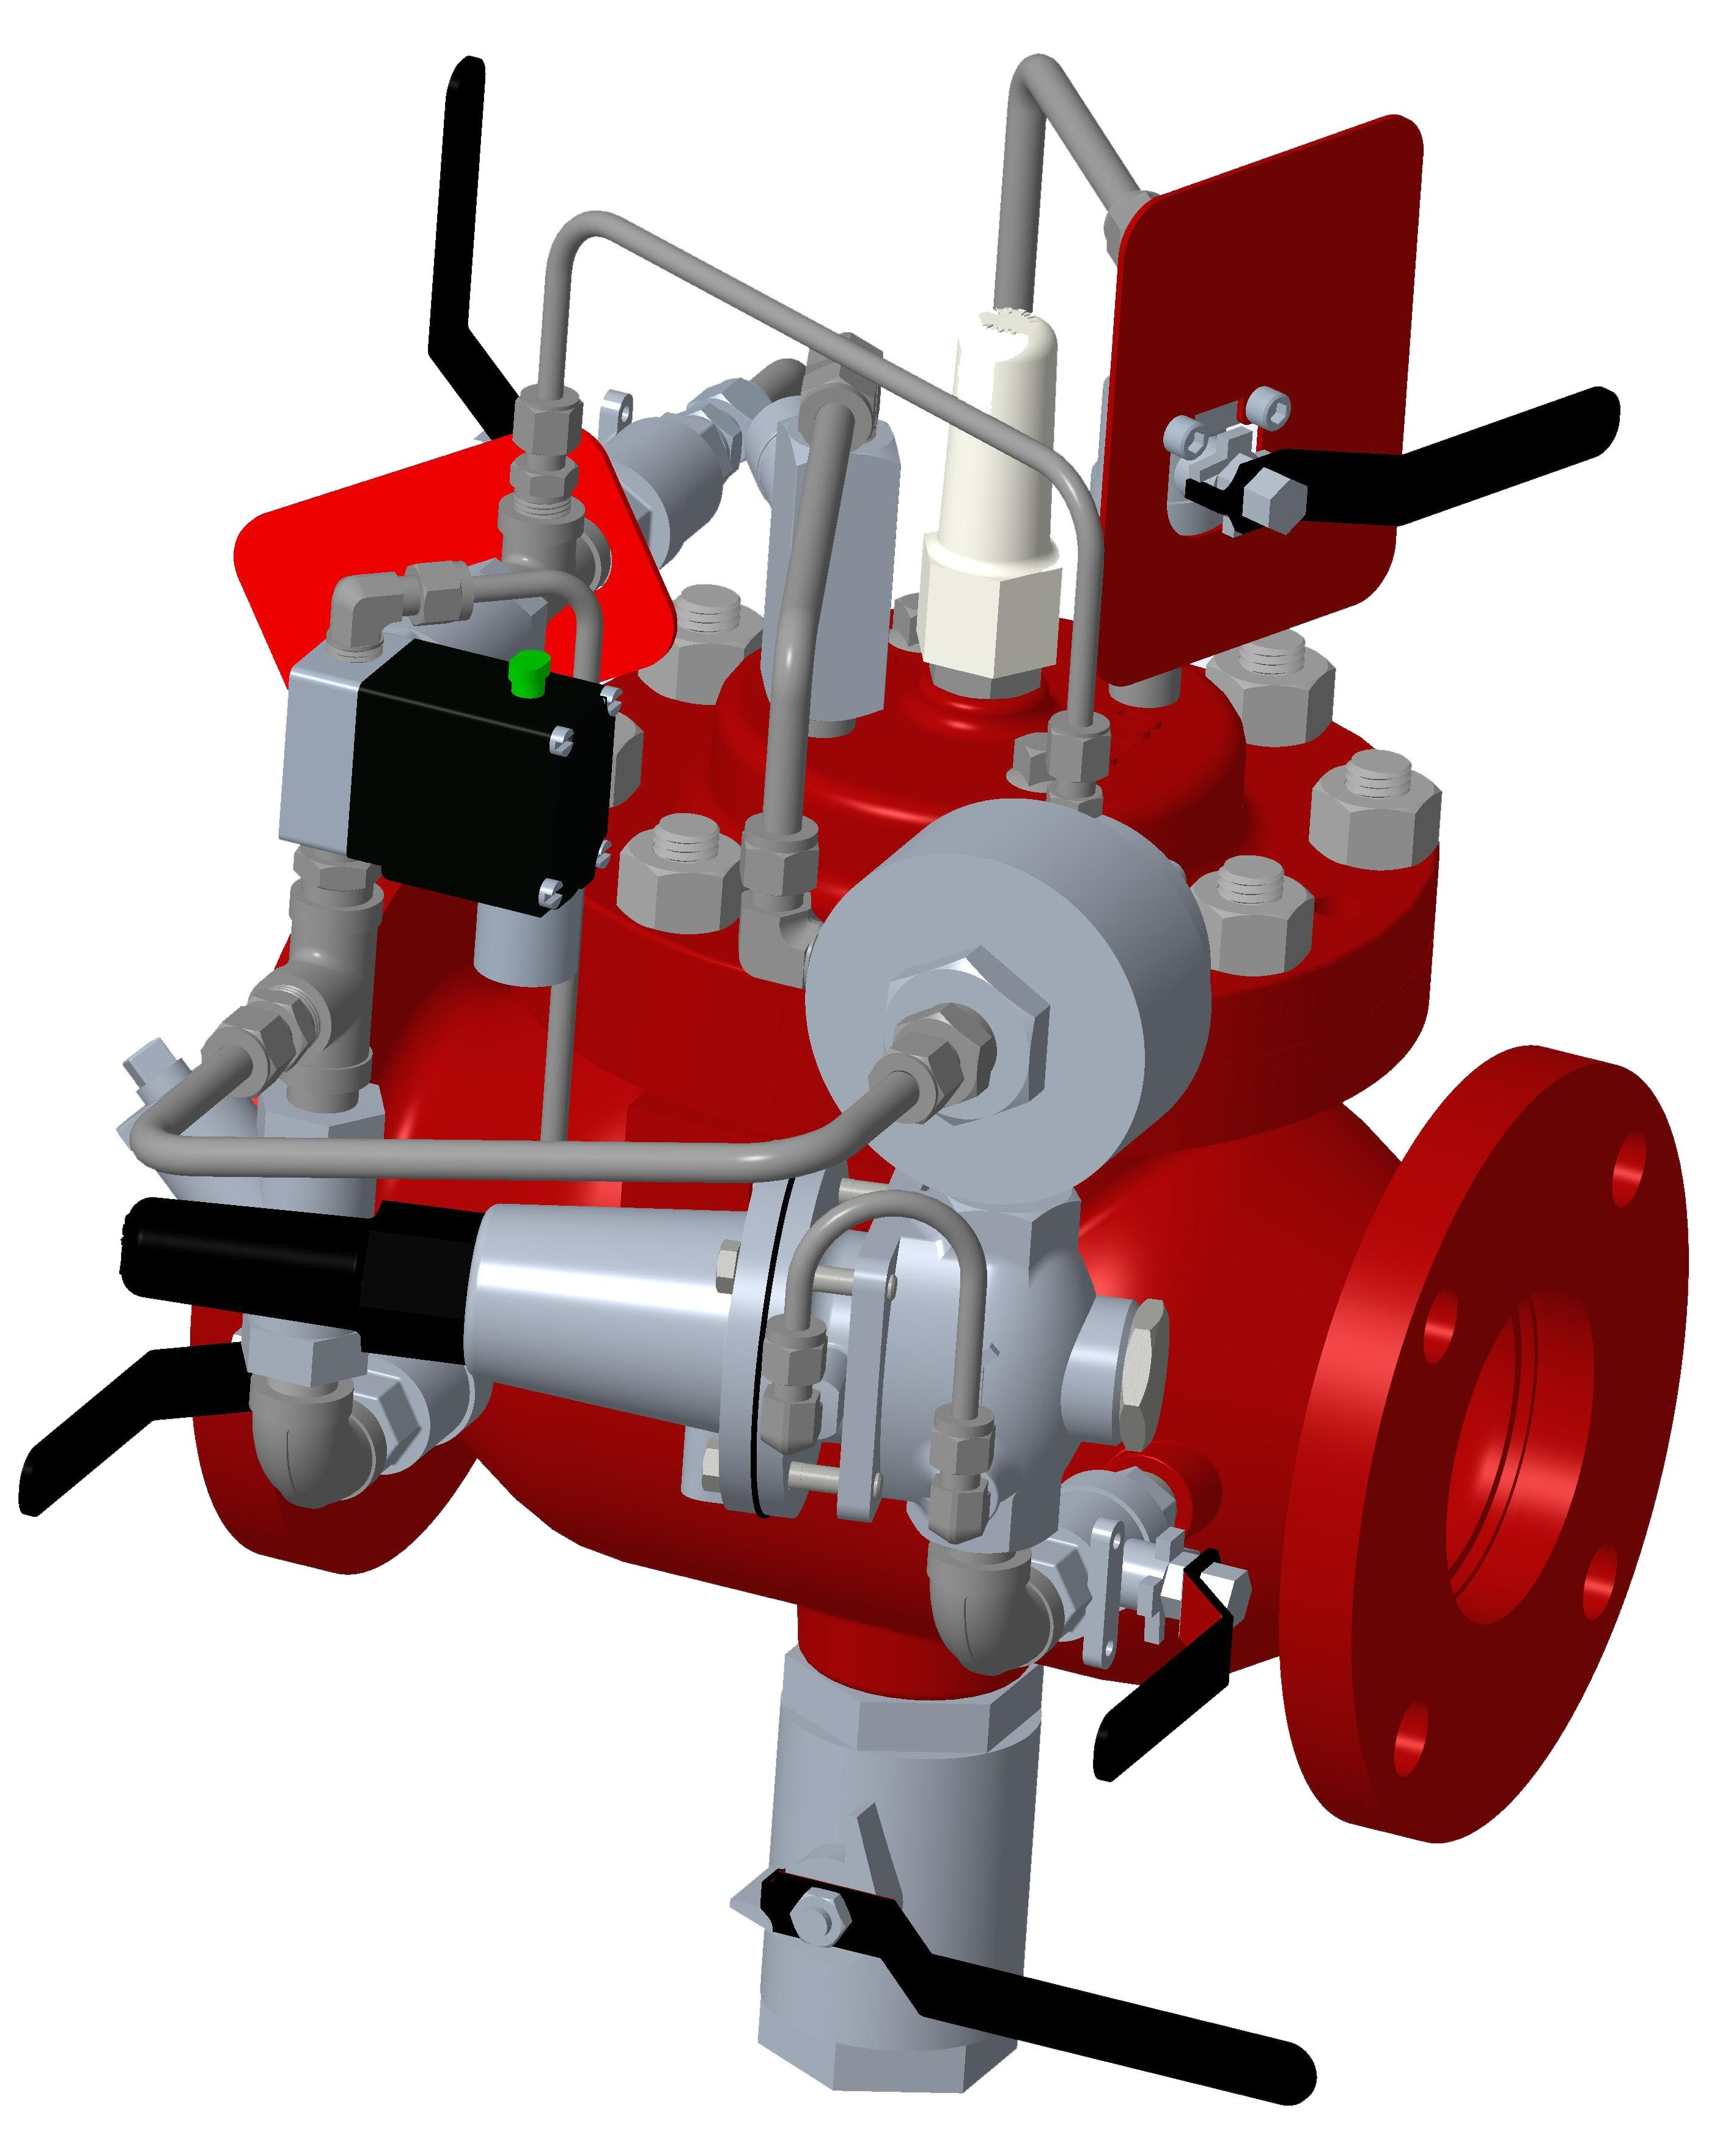 Model 116-5MR Pressure Reducing/Solenoid Shutoff Deluge